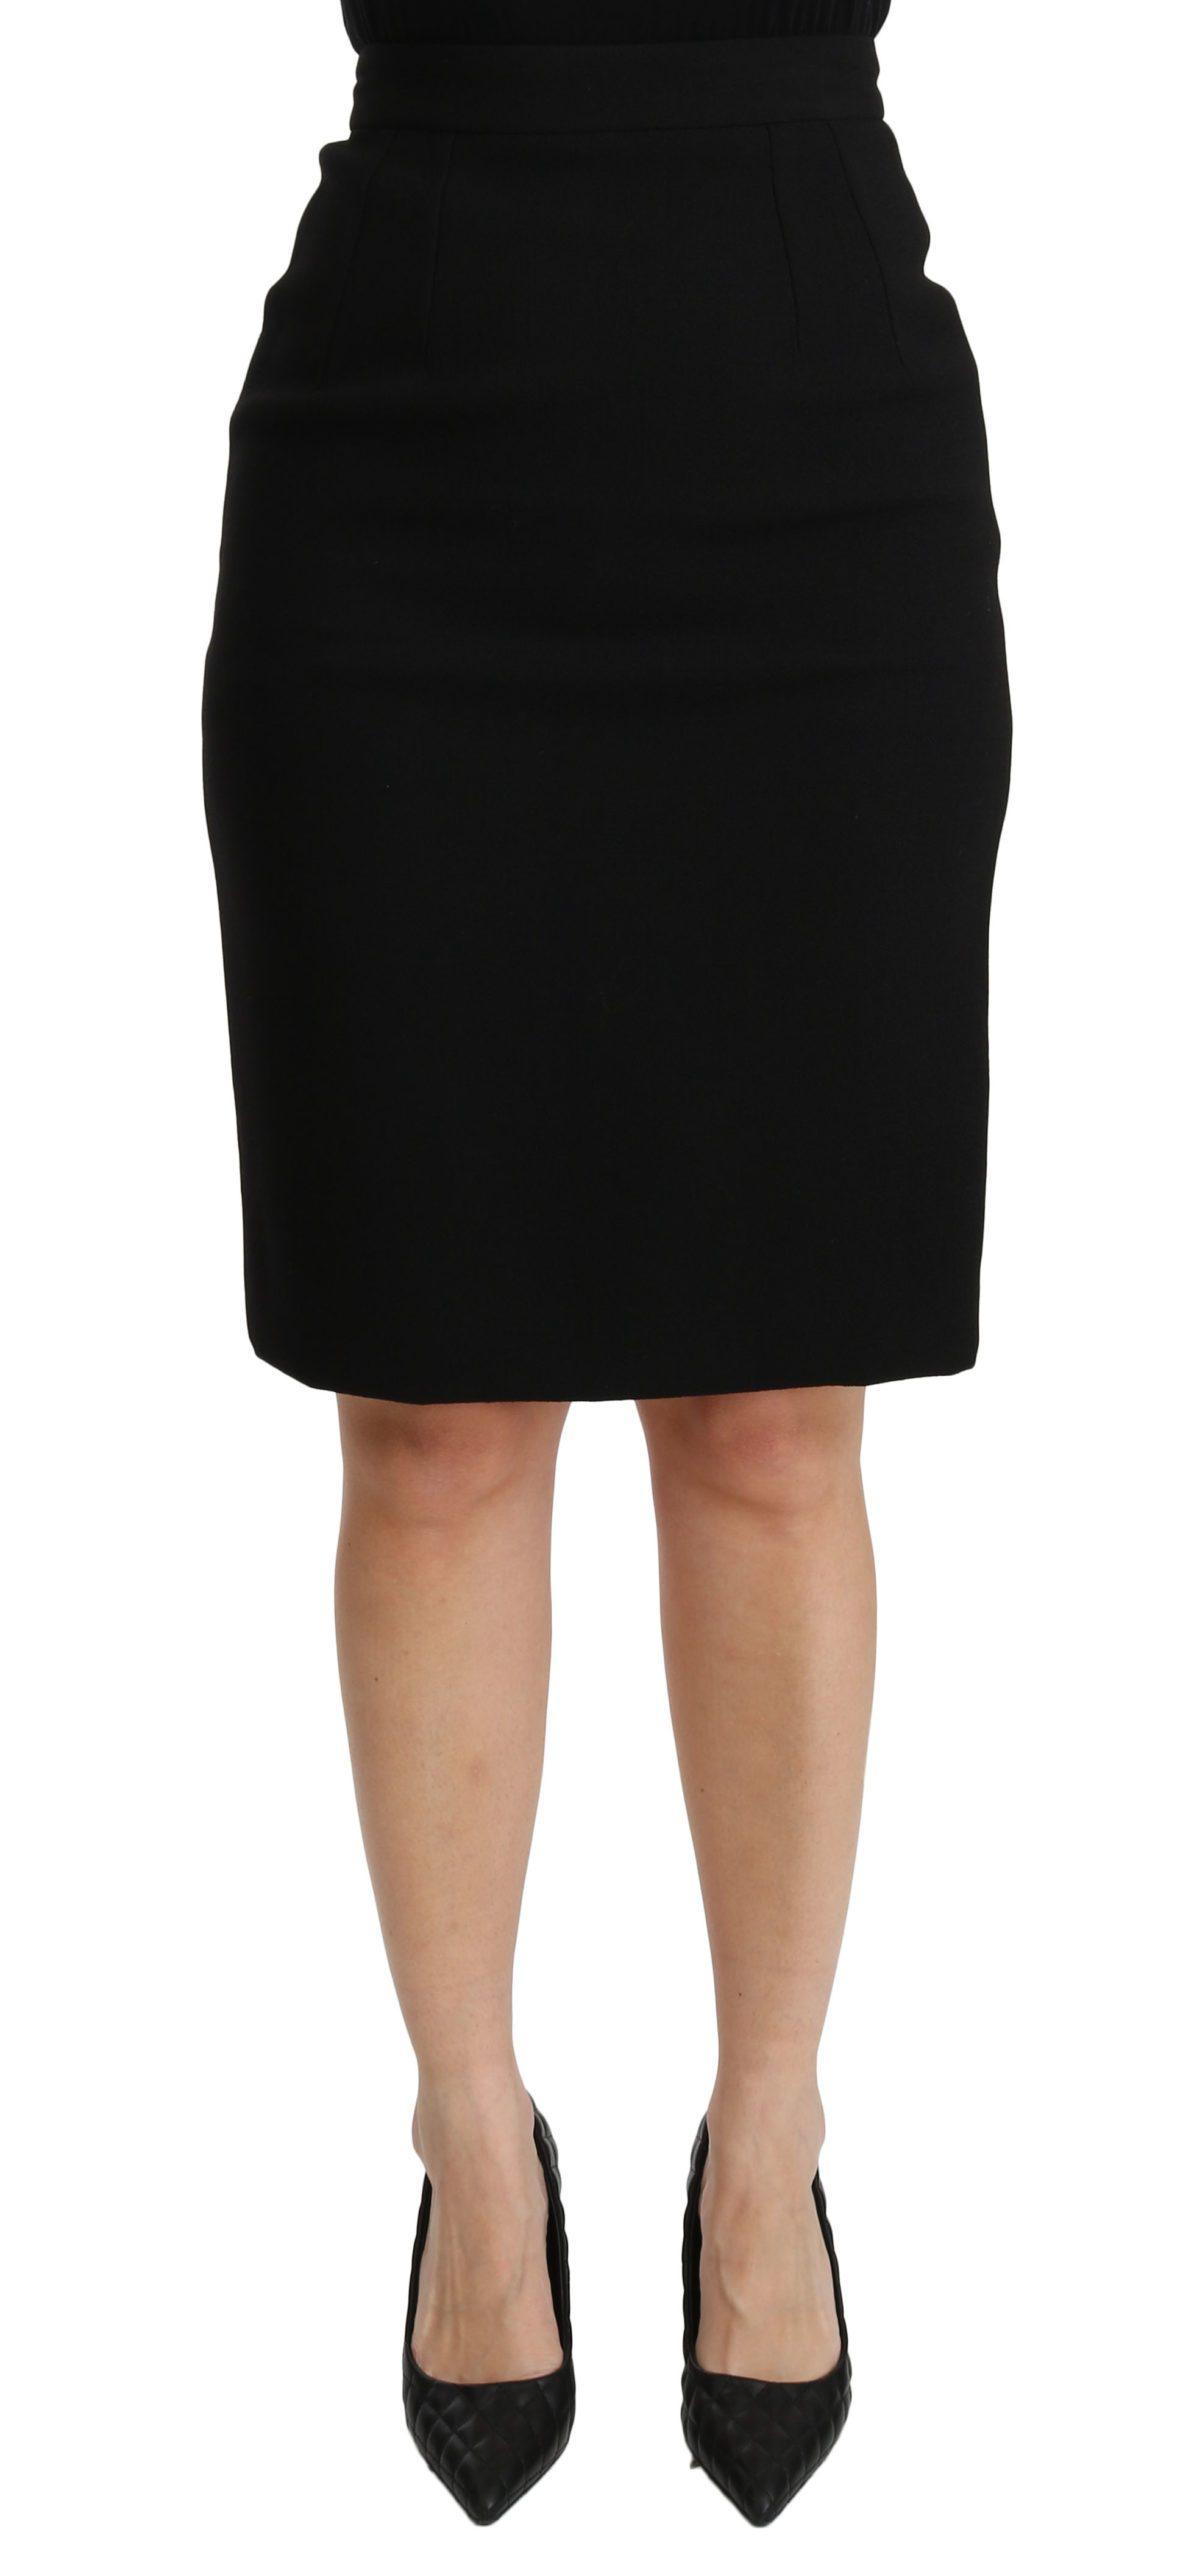 Dolce & Gabbana Women's Pencil Cut High Waist Skirt Black SKI1381 - IT40|S